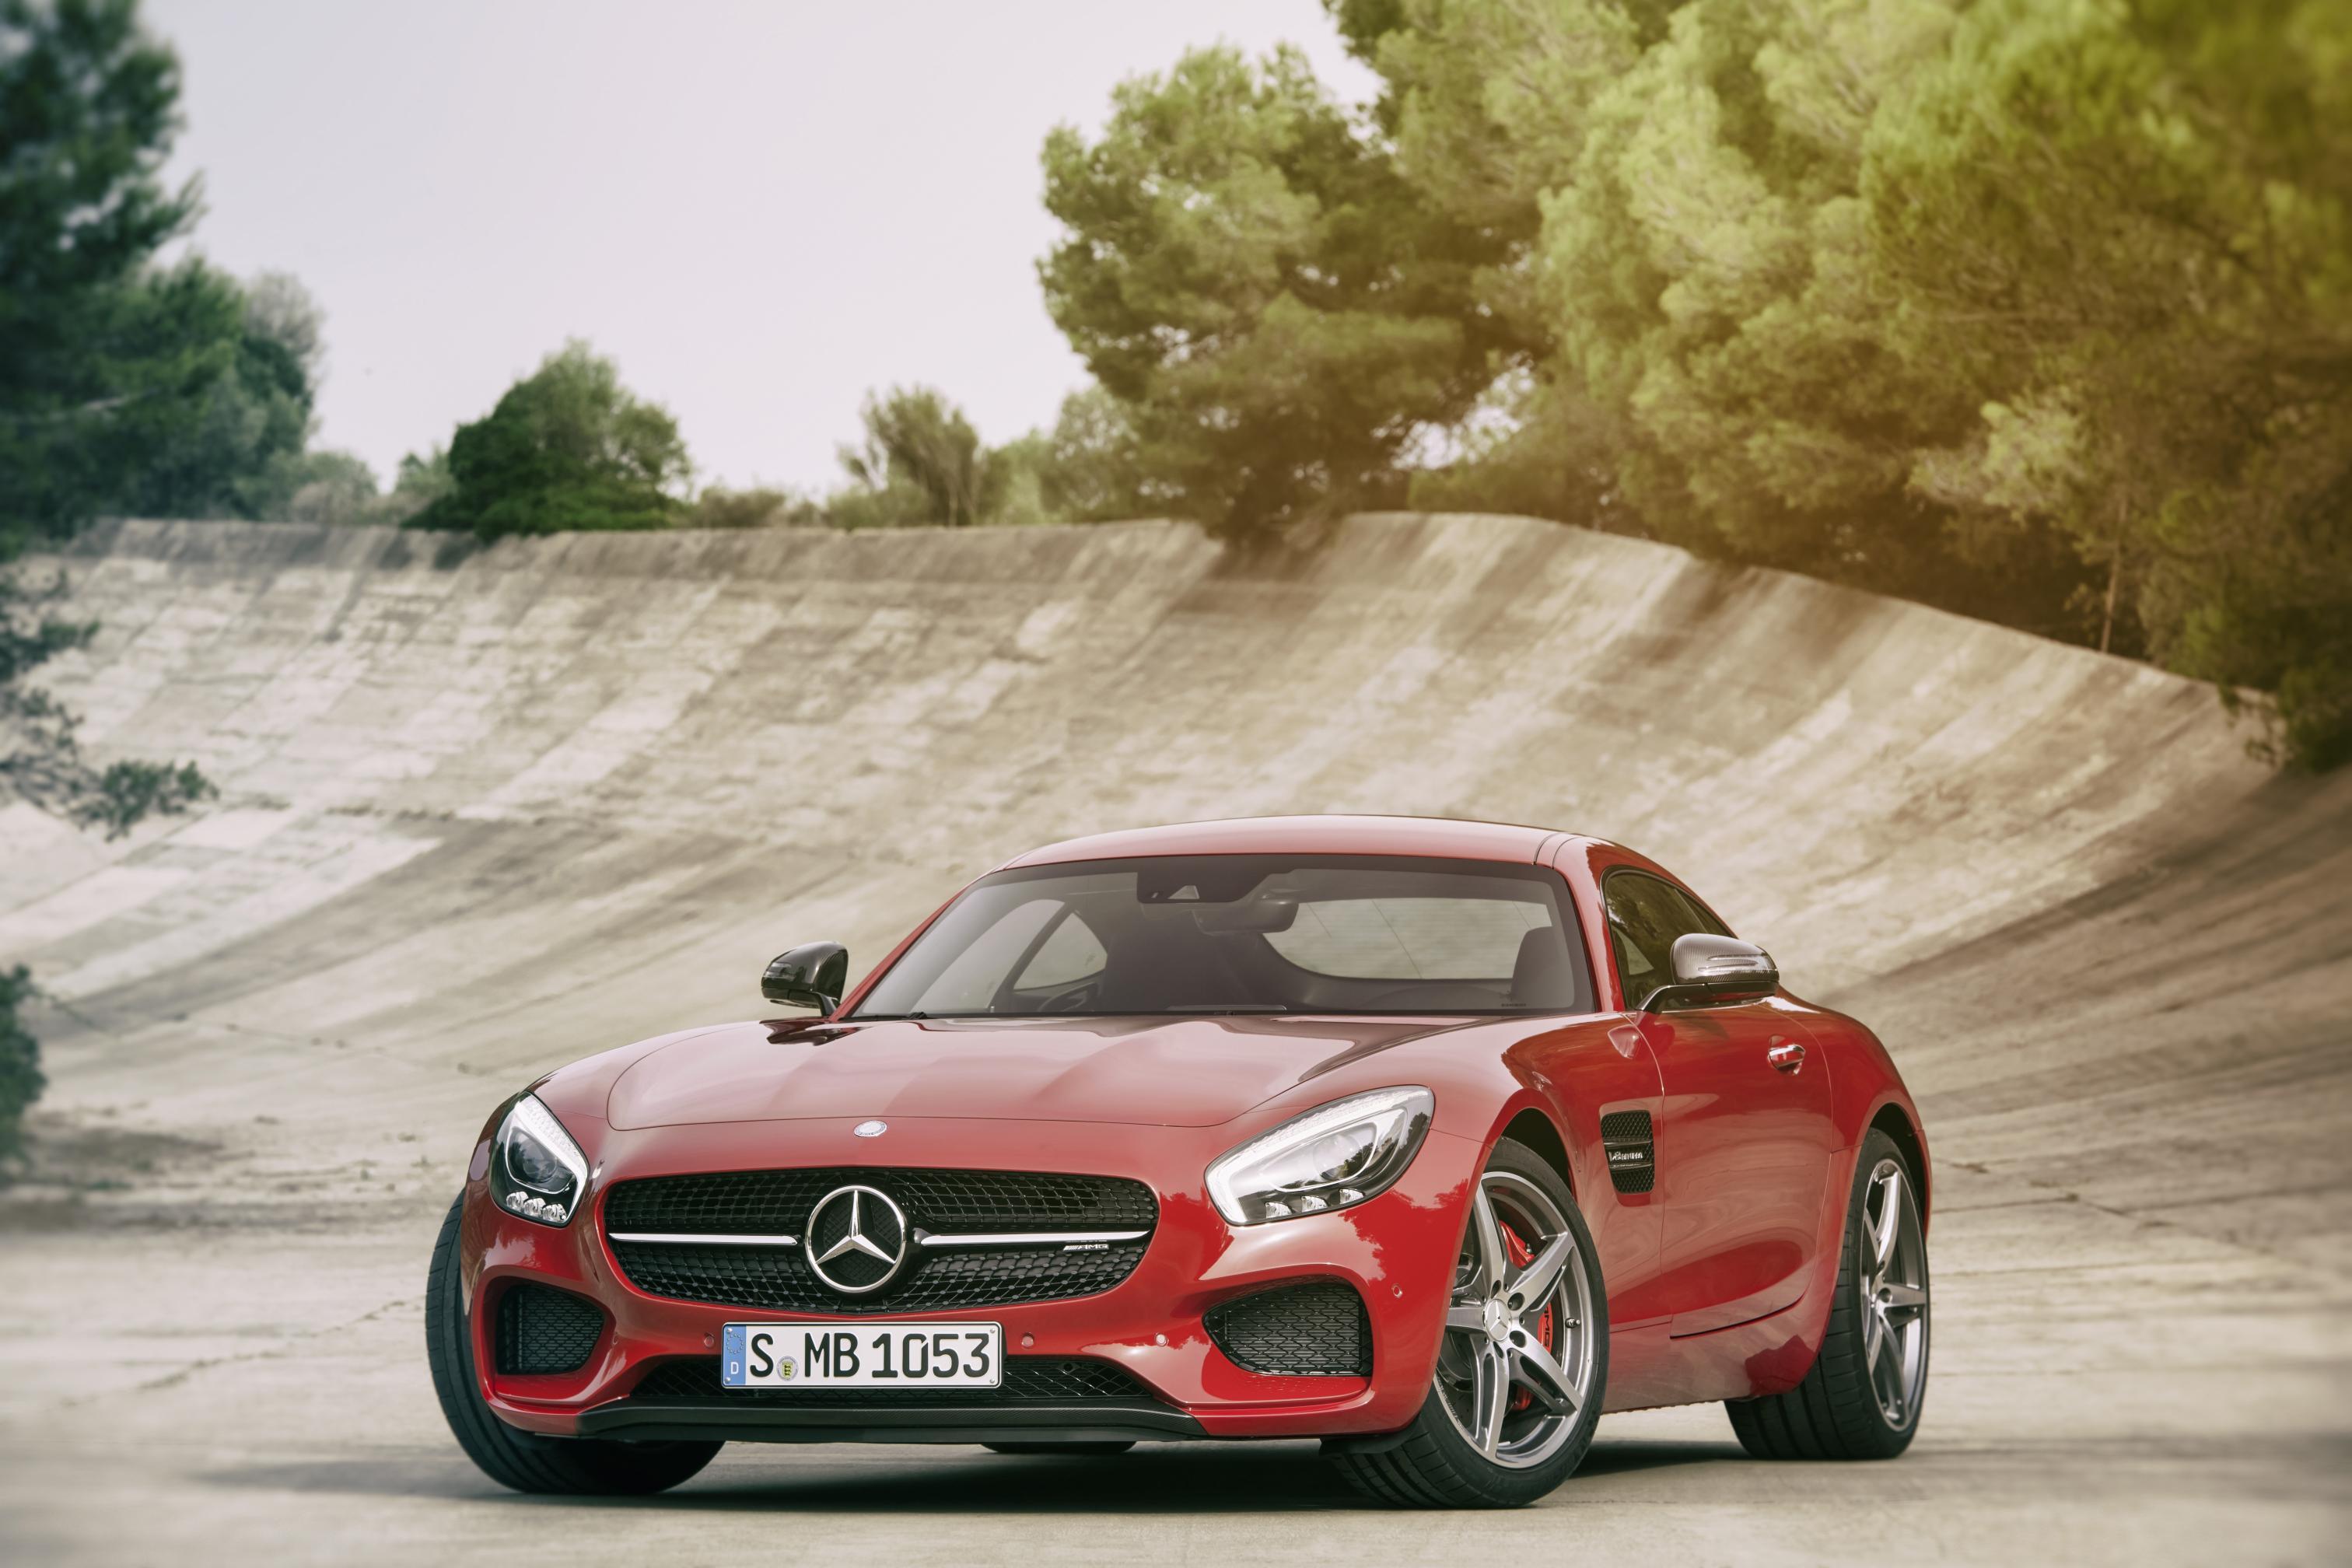 Mercedes-AMG GT:  ecco la nuova supercar Made in Germany